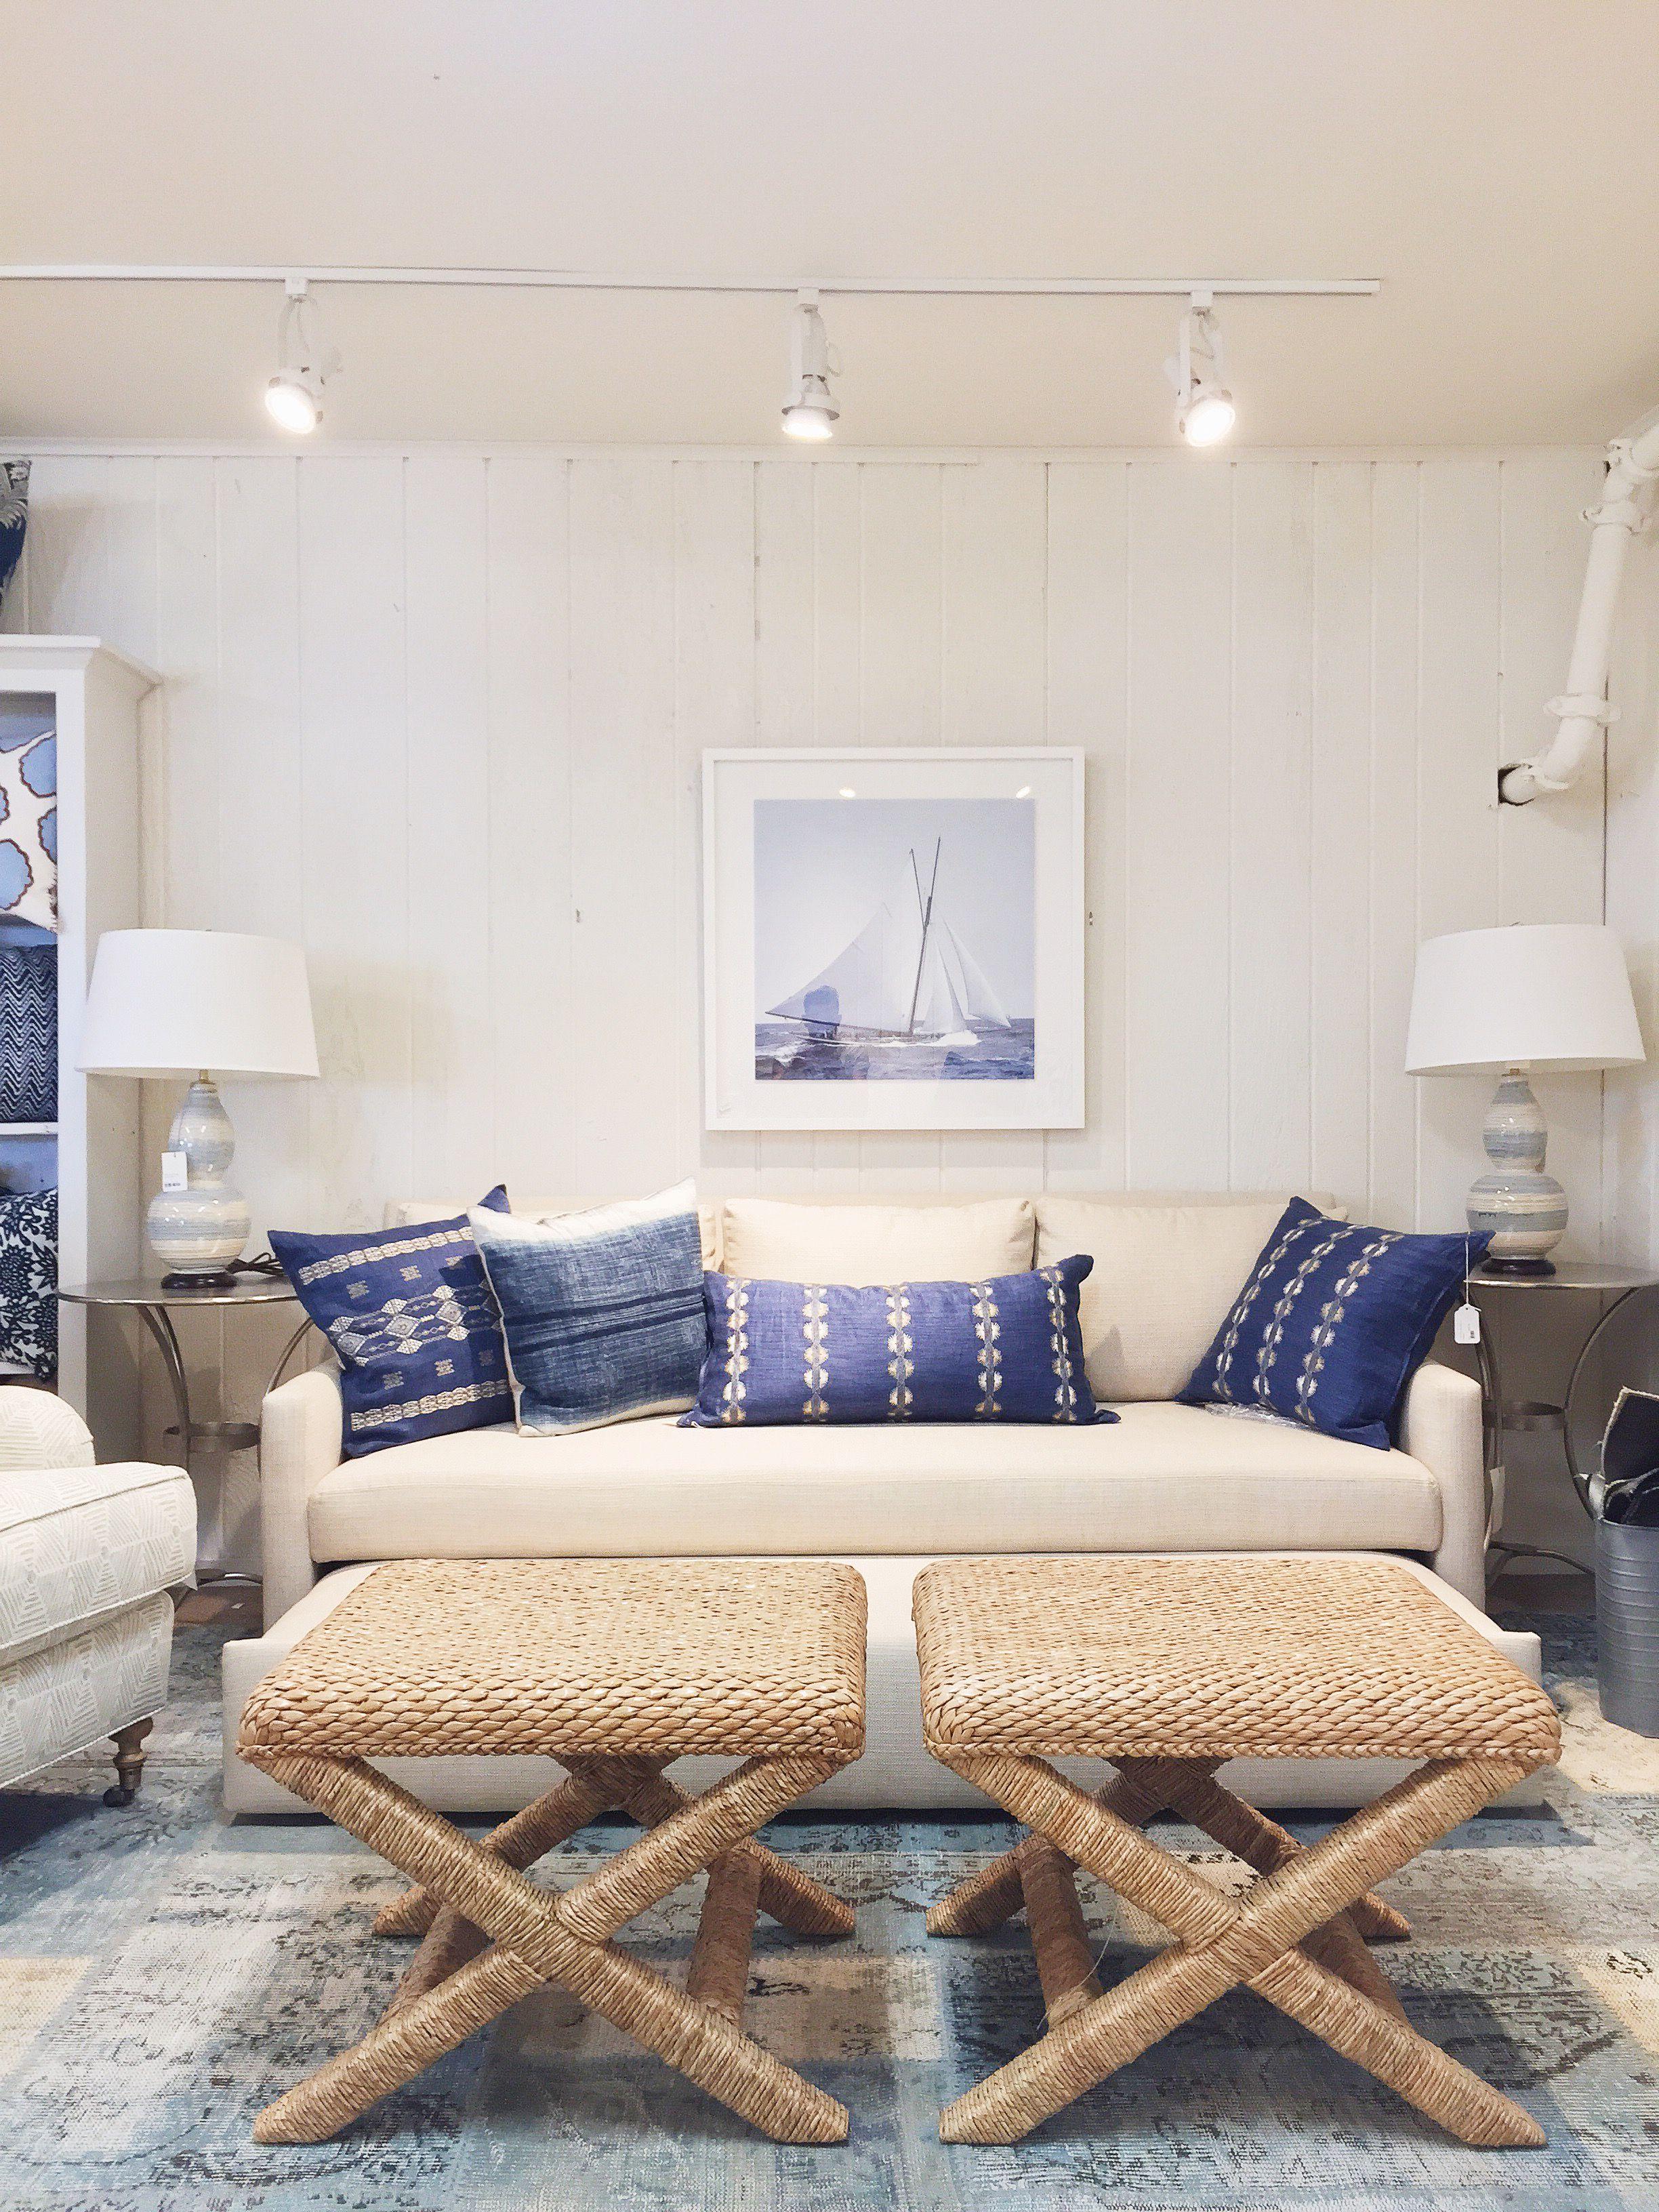 Fisher S Home Furnishings Home Home Furnishings Home Decor